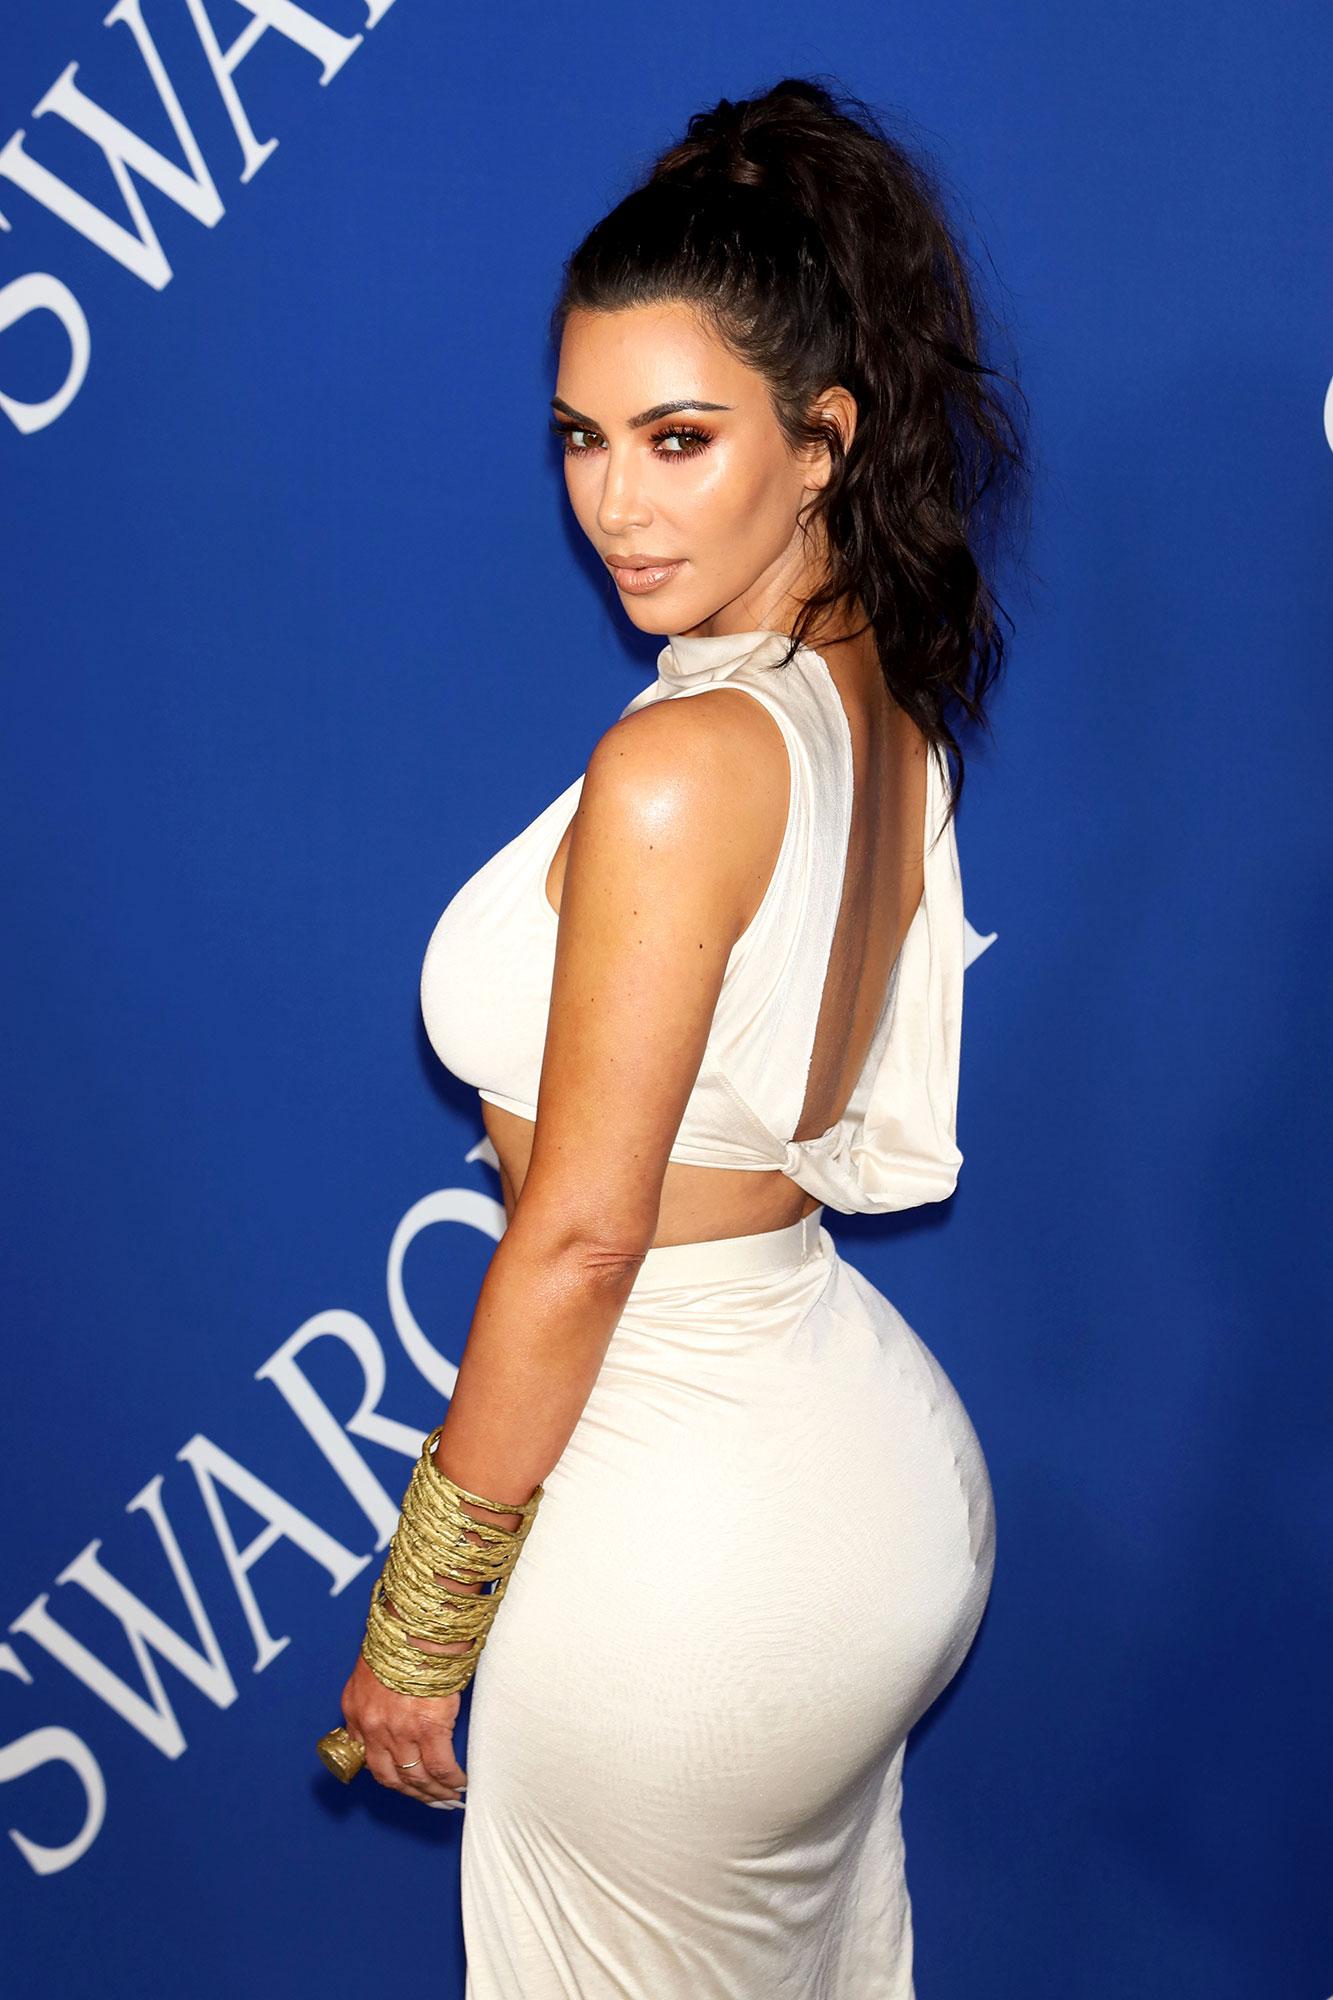 Nothing kim kardashian golden shower video the same